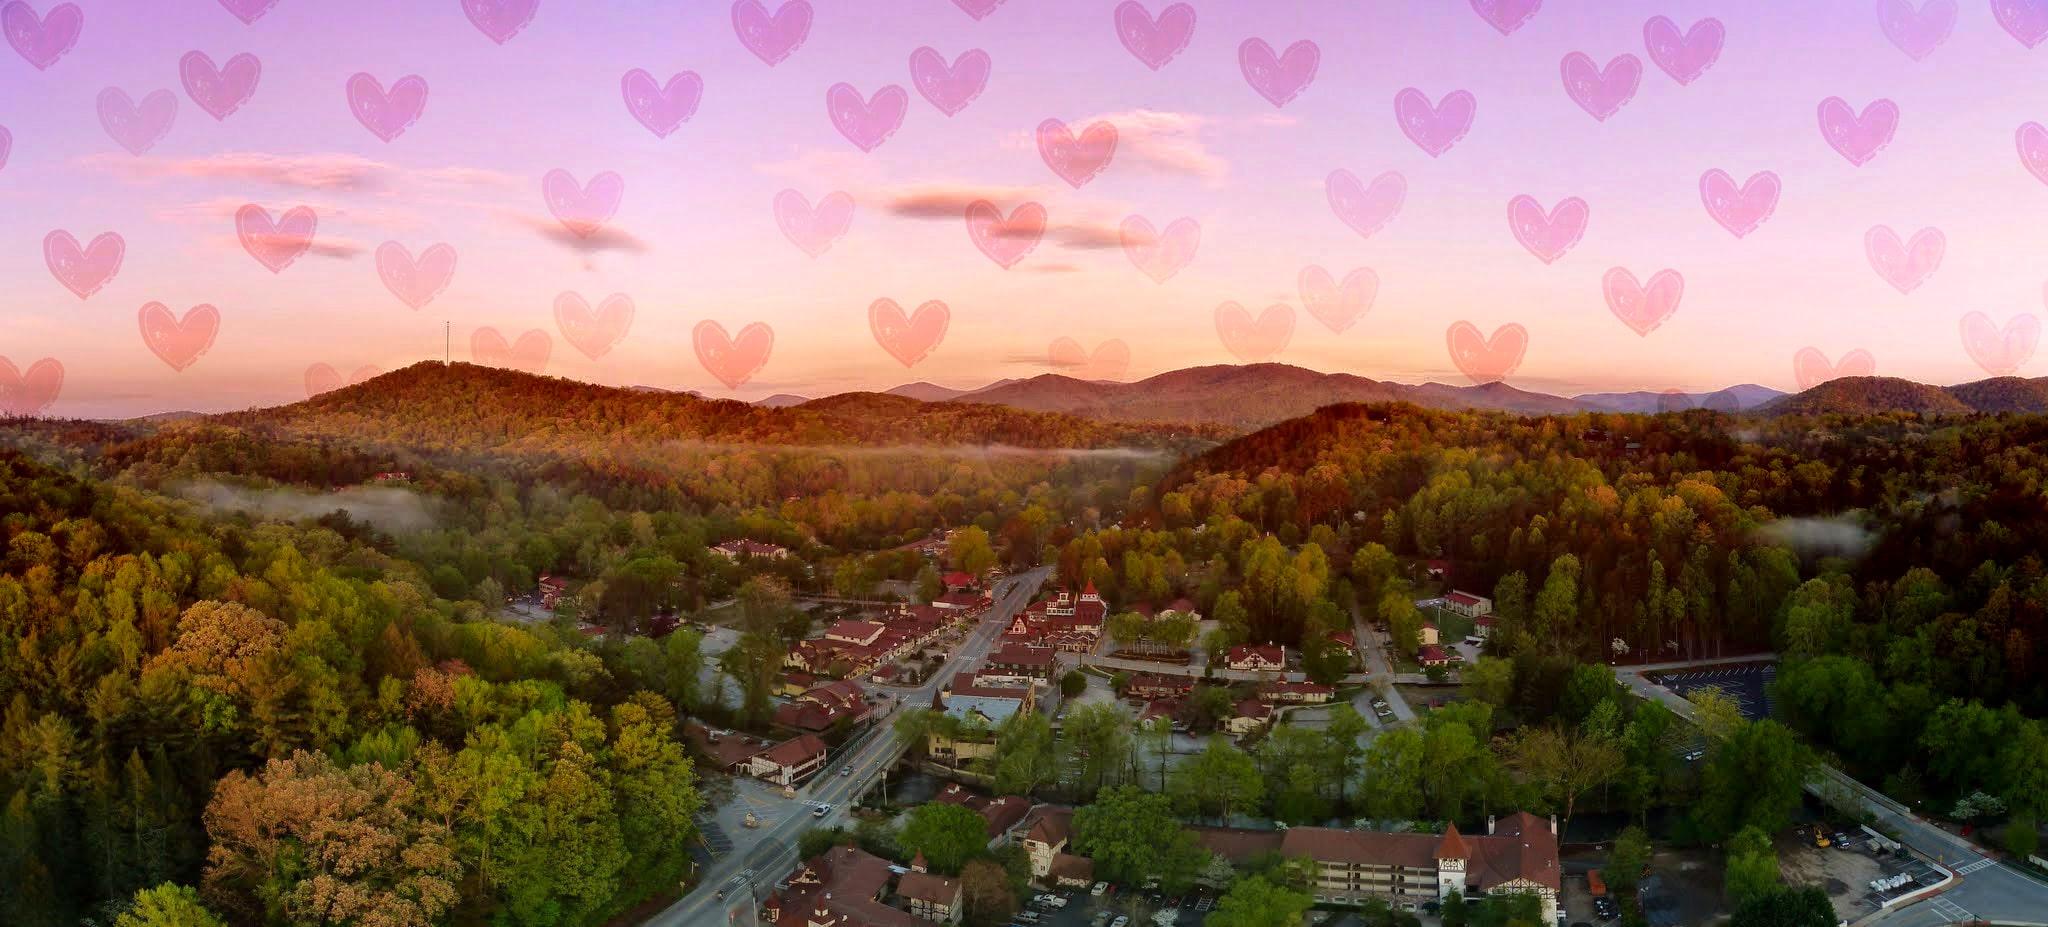 Valentine-banner-Cedar-Creek-Cabin-Rentals-Helen-Georgia-home-rose-hearts